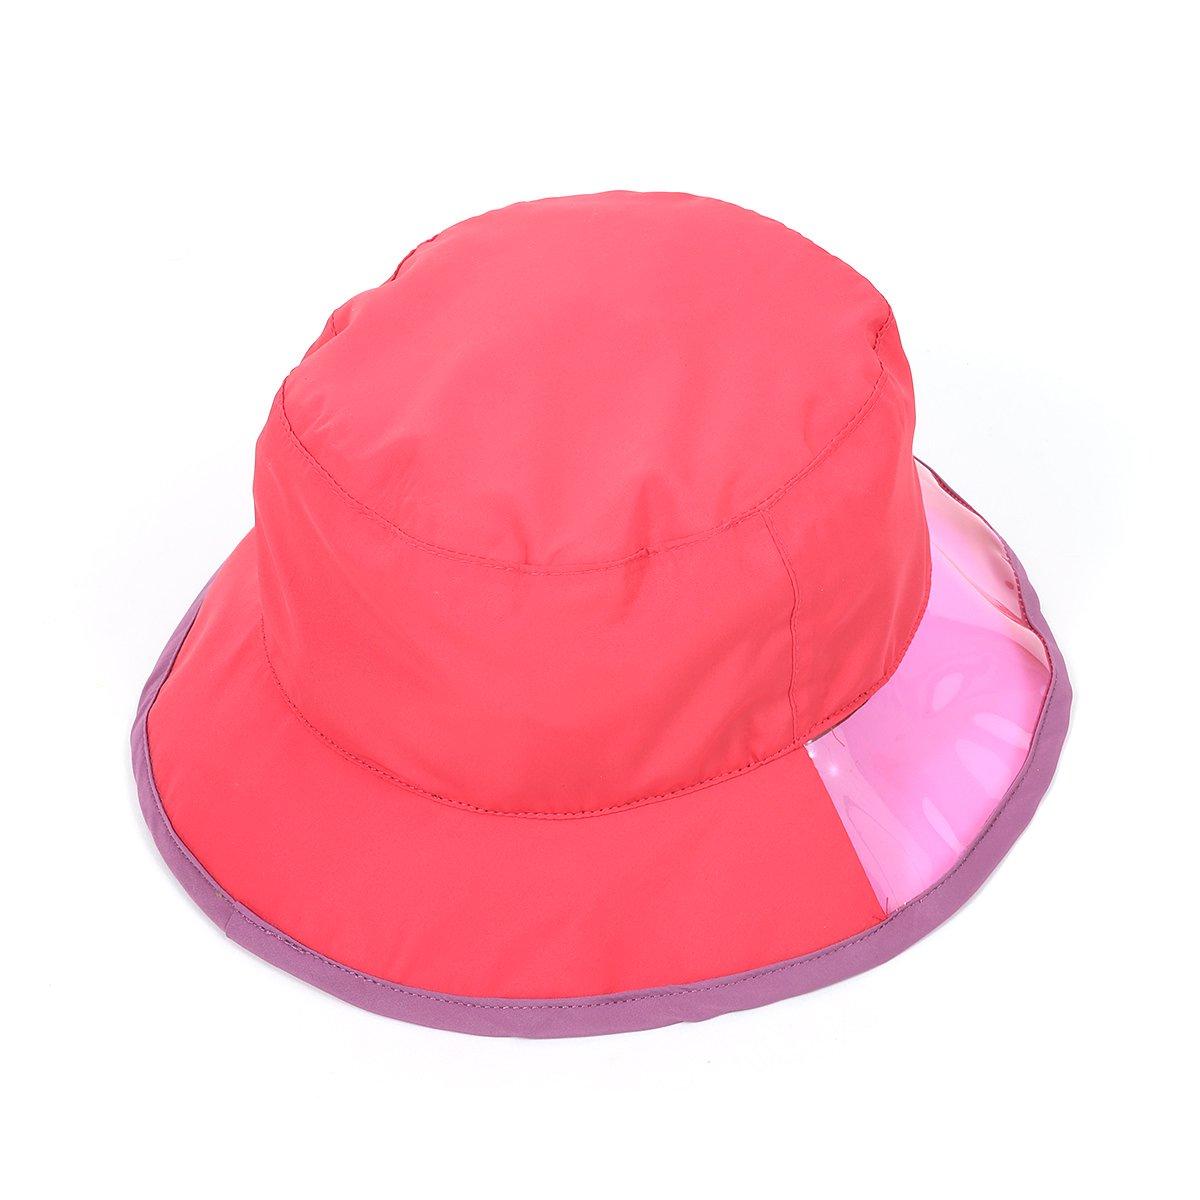 【BABY】Baby Rain PVC Hat 詳細画像5